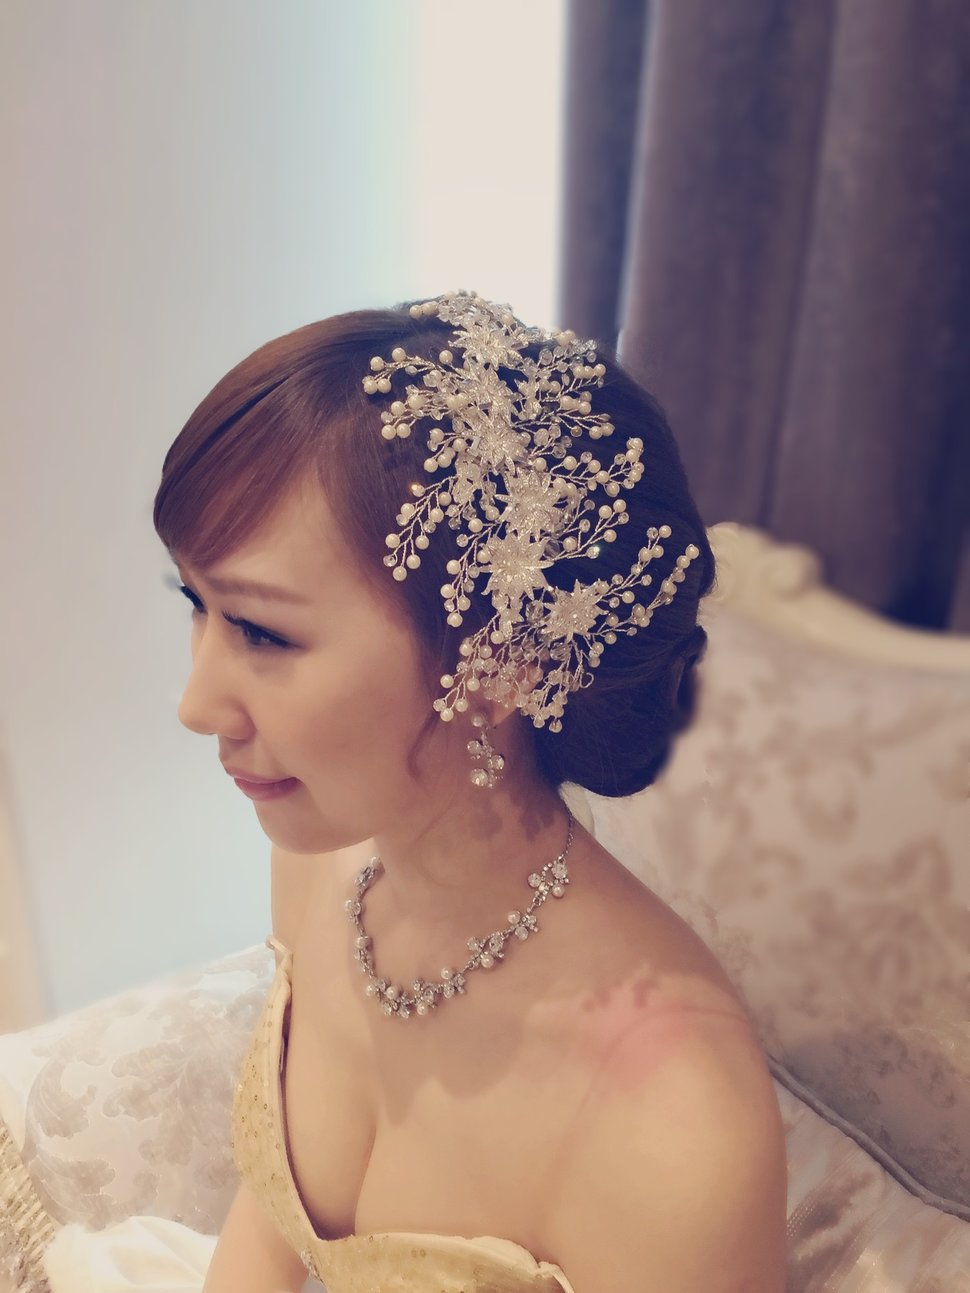 IMG_0246 - Jojo chen Makeup新娘秘書《結婚吧》